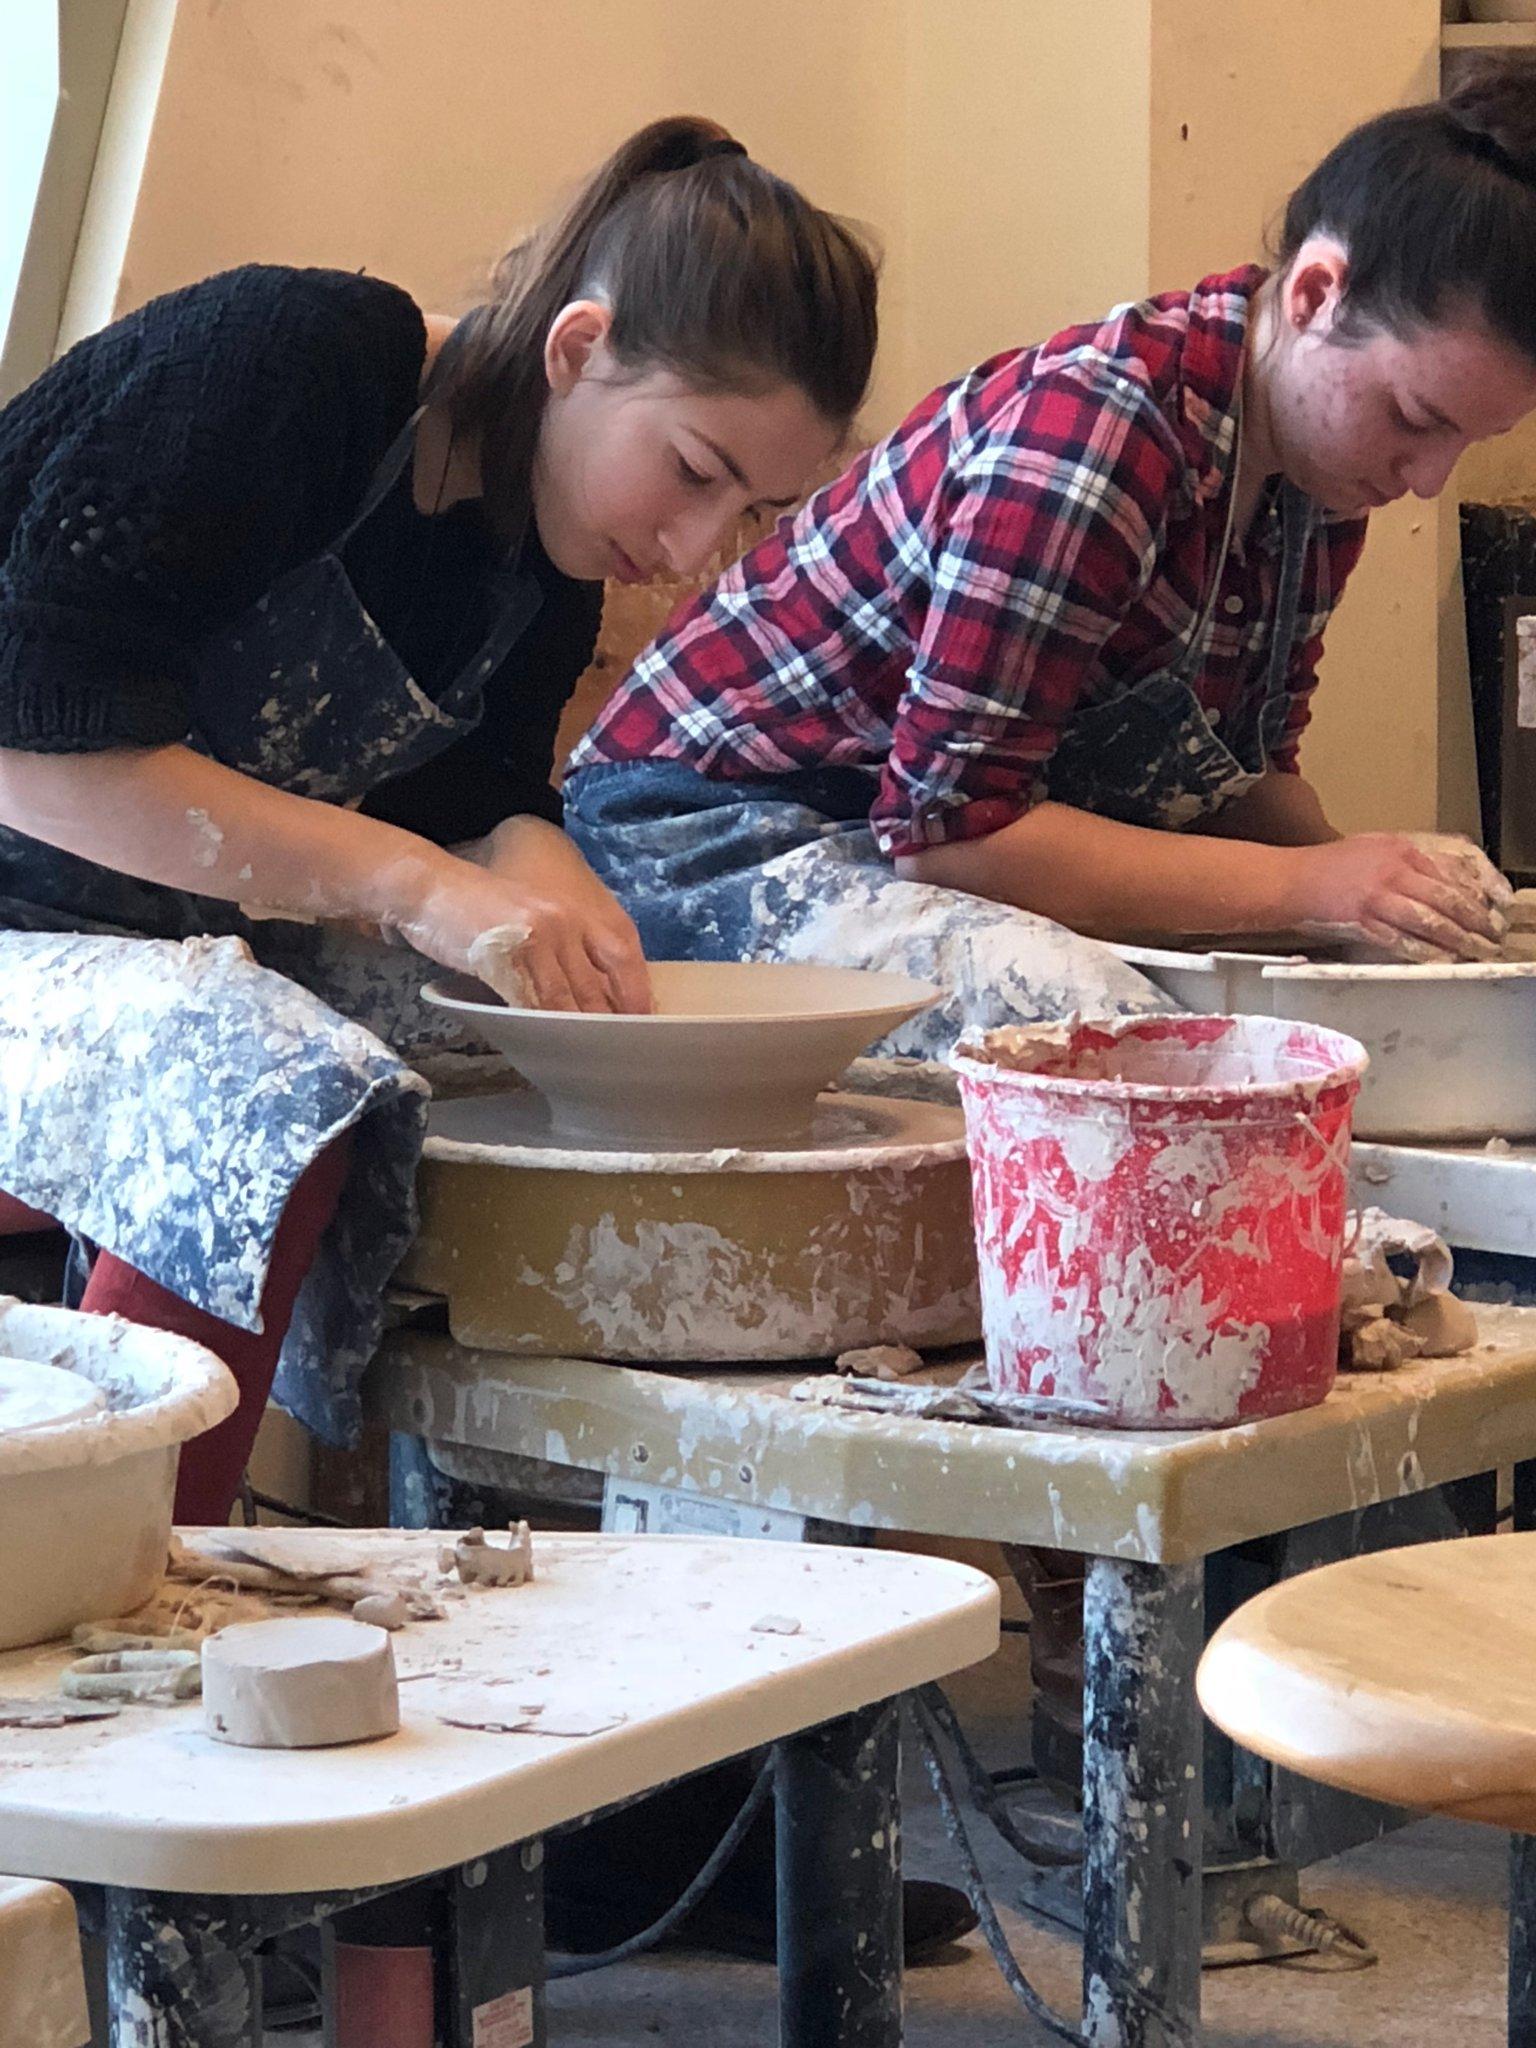 Ceramics - Buckingham Browne & Nichols